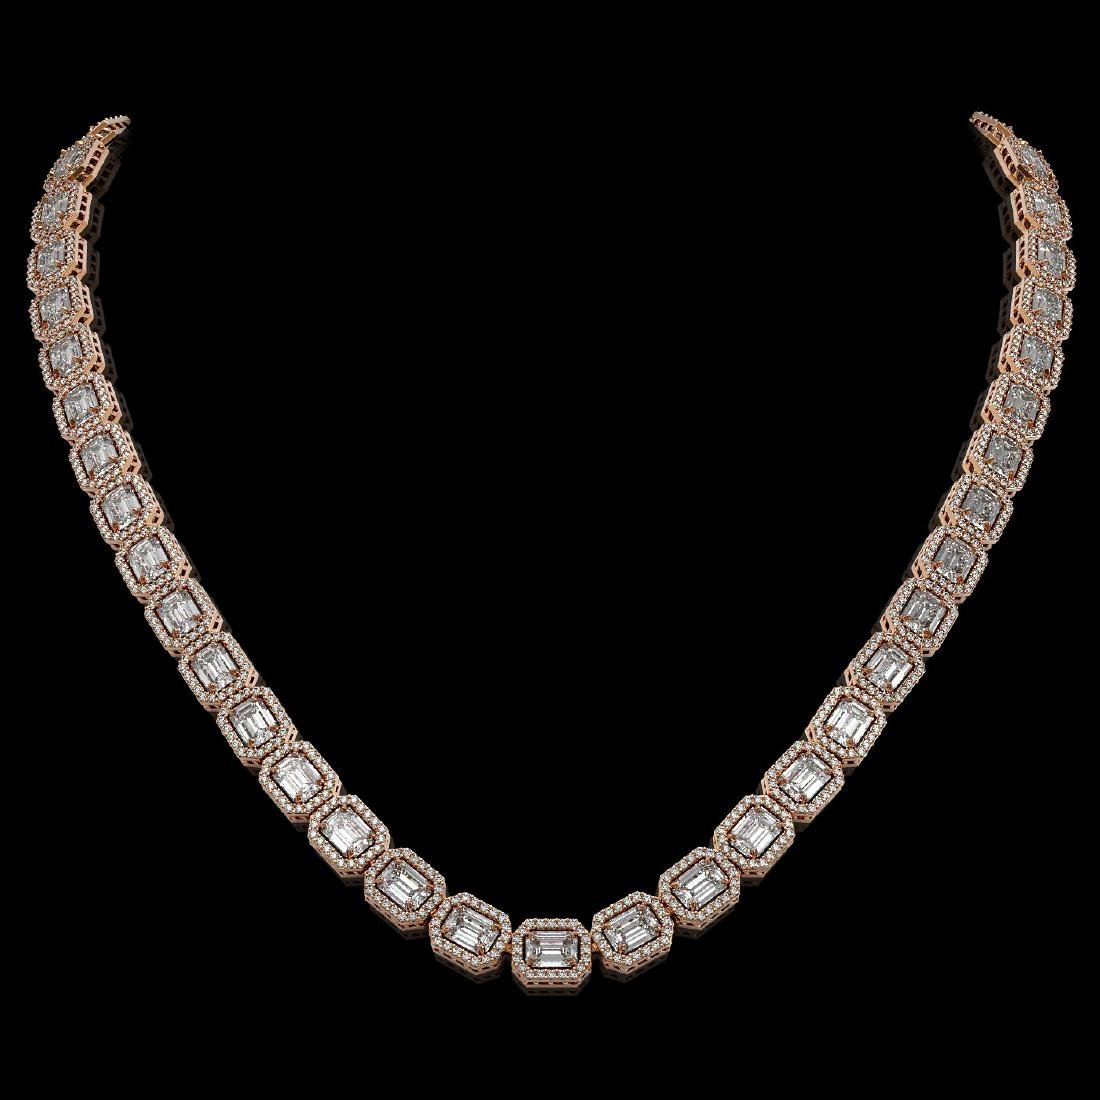 33.10 ctw Emerald Diamond Necklace 18K Rose Gold -